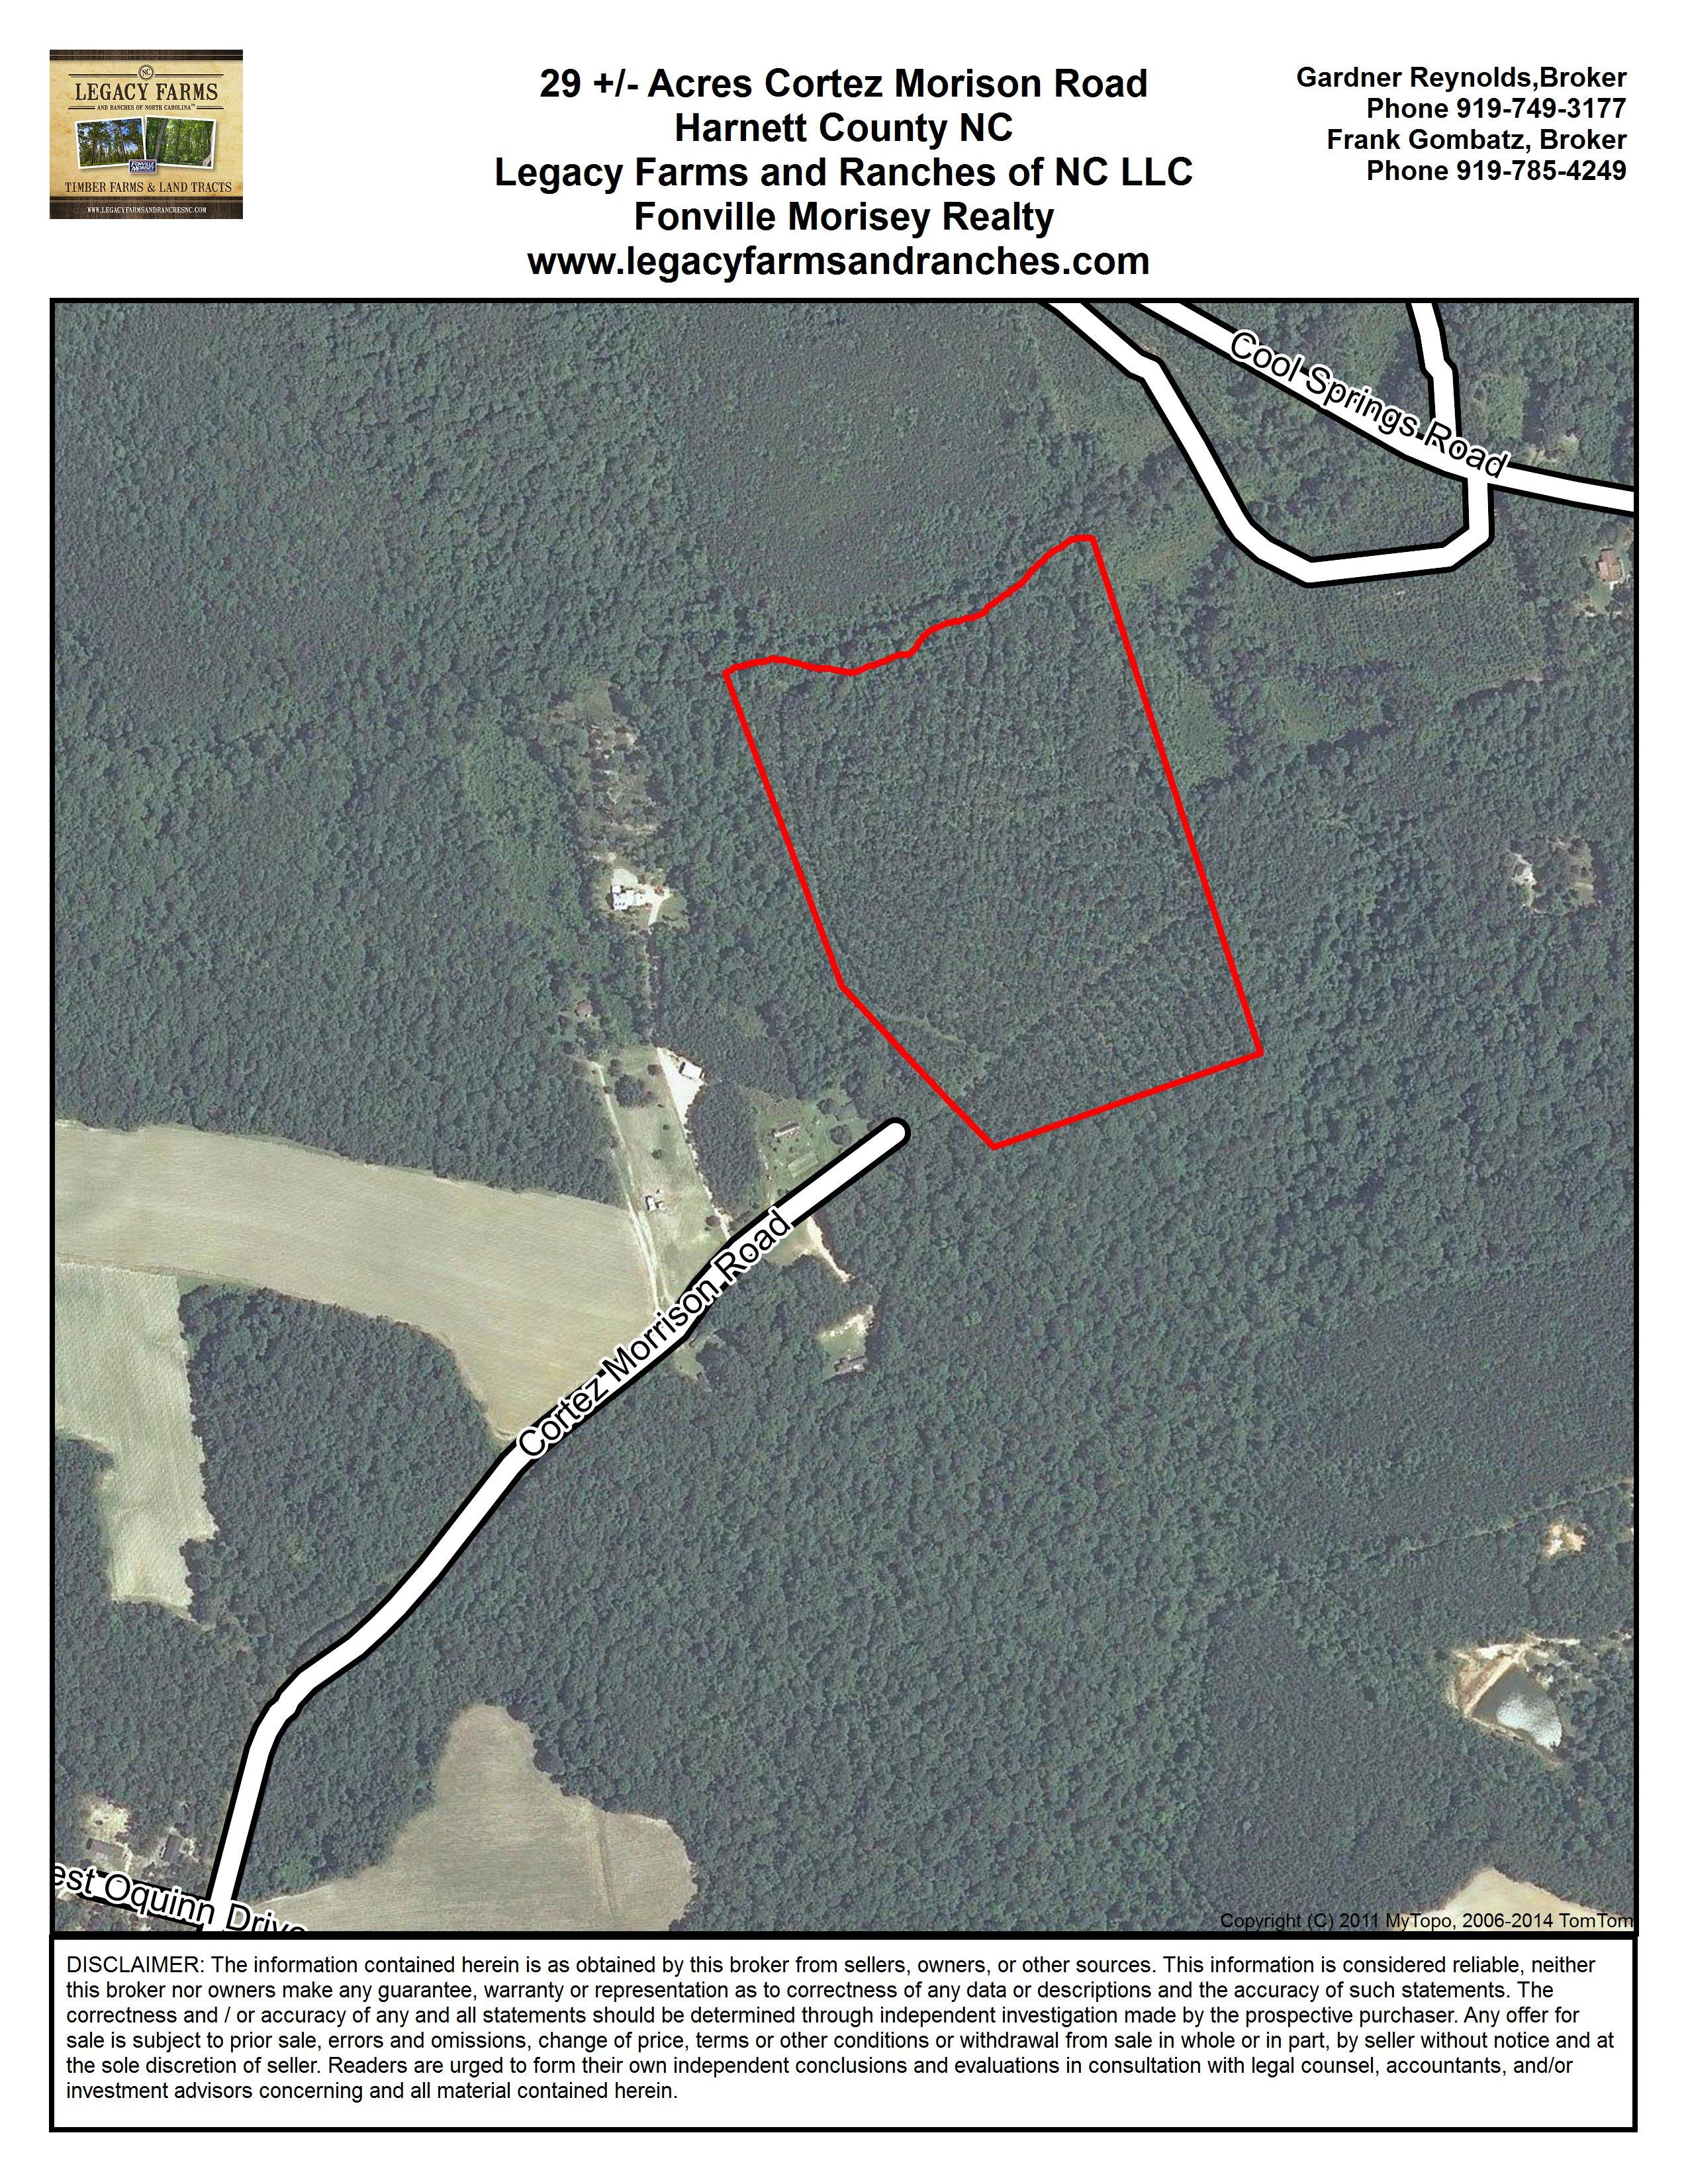 Harnett County NC 29 Acres off Cortez Morrison Road